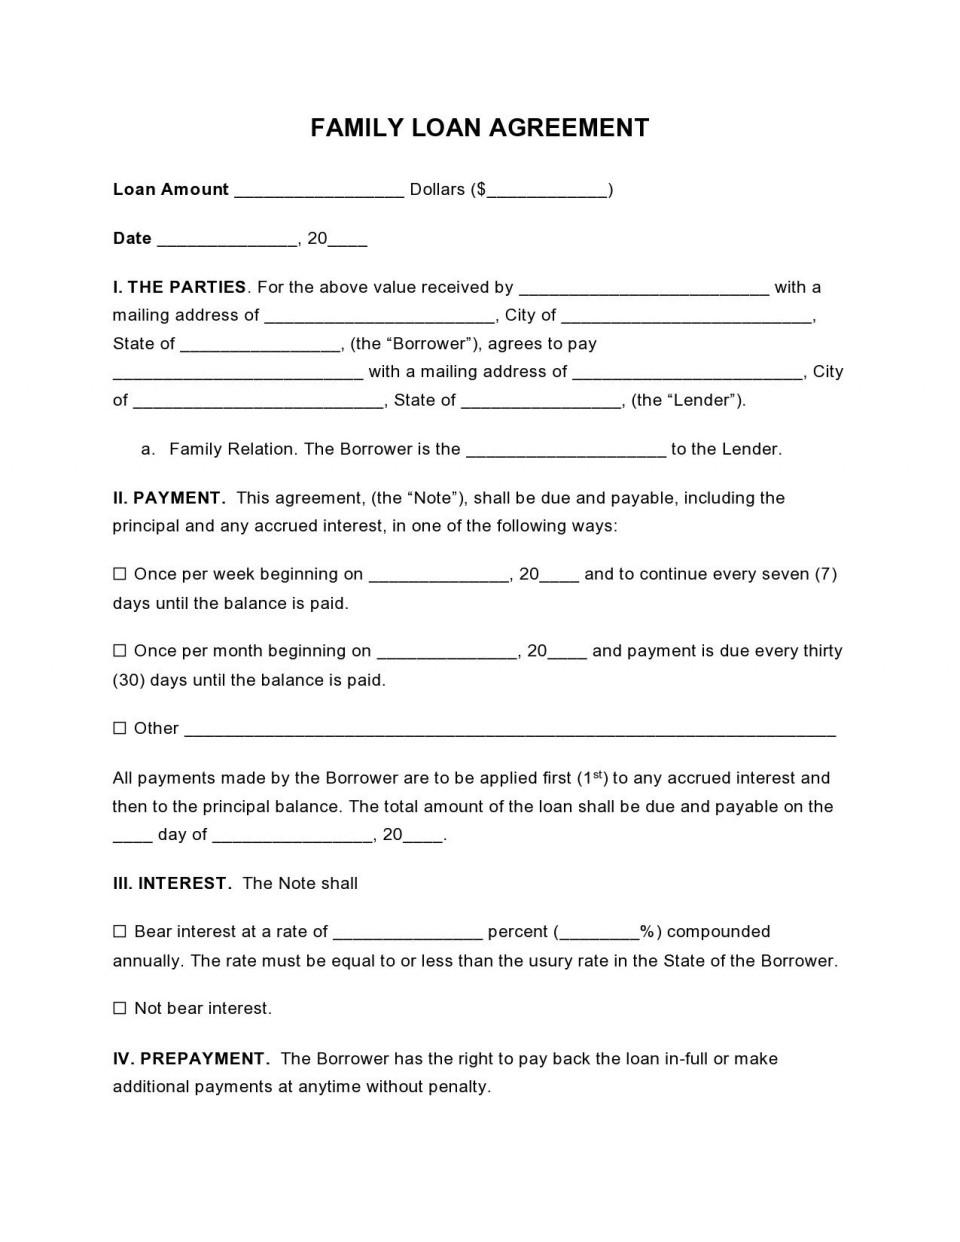 000 Wondrou Free Family Loan Agreement Template Nz High Definition 960